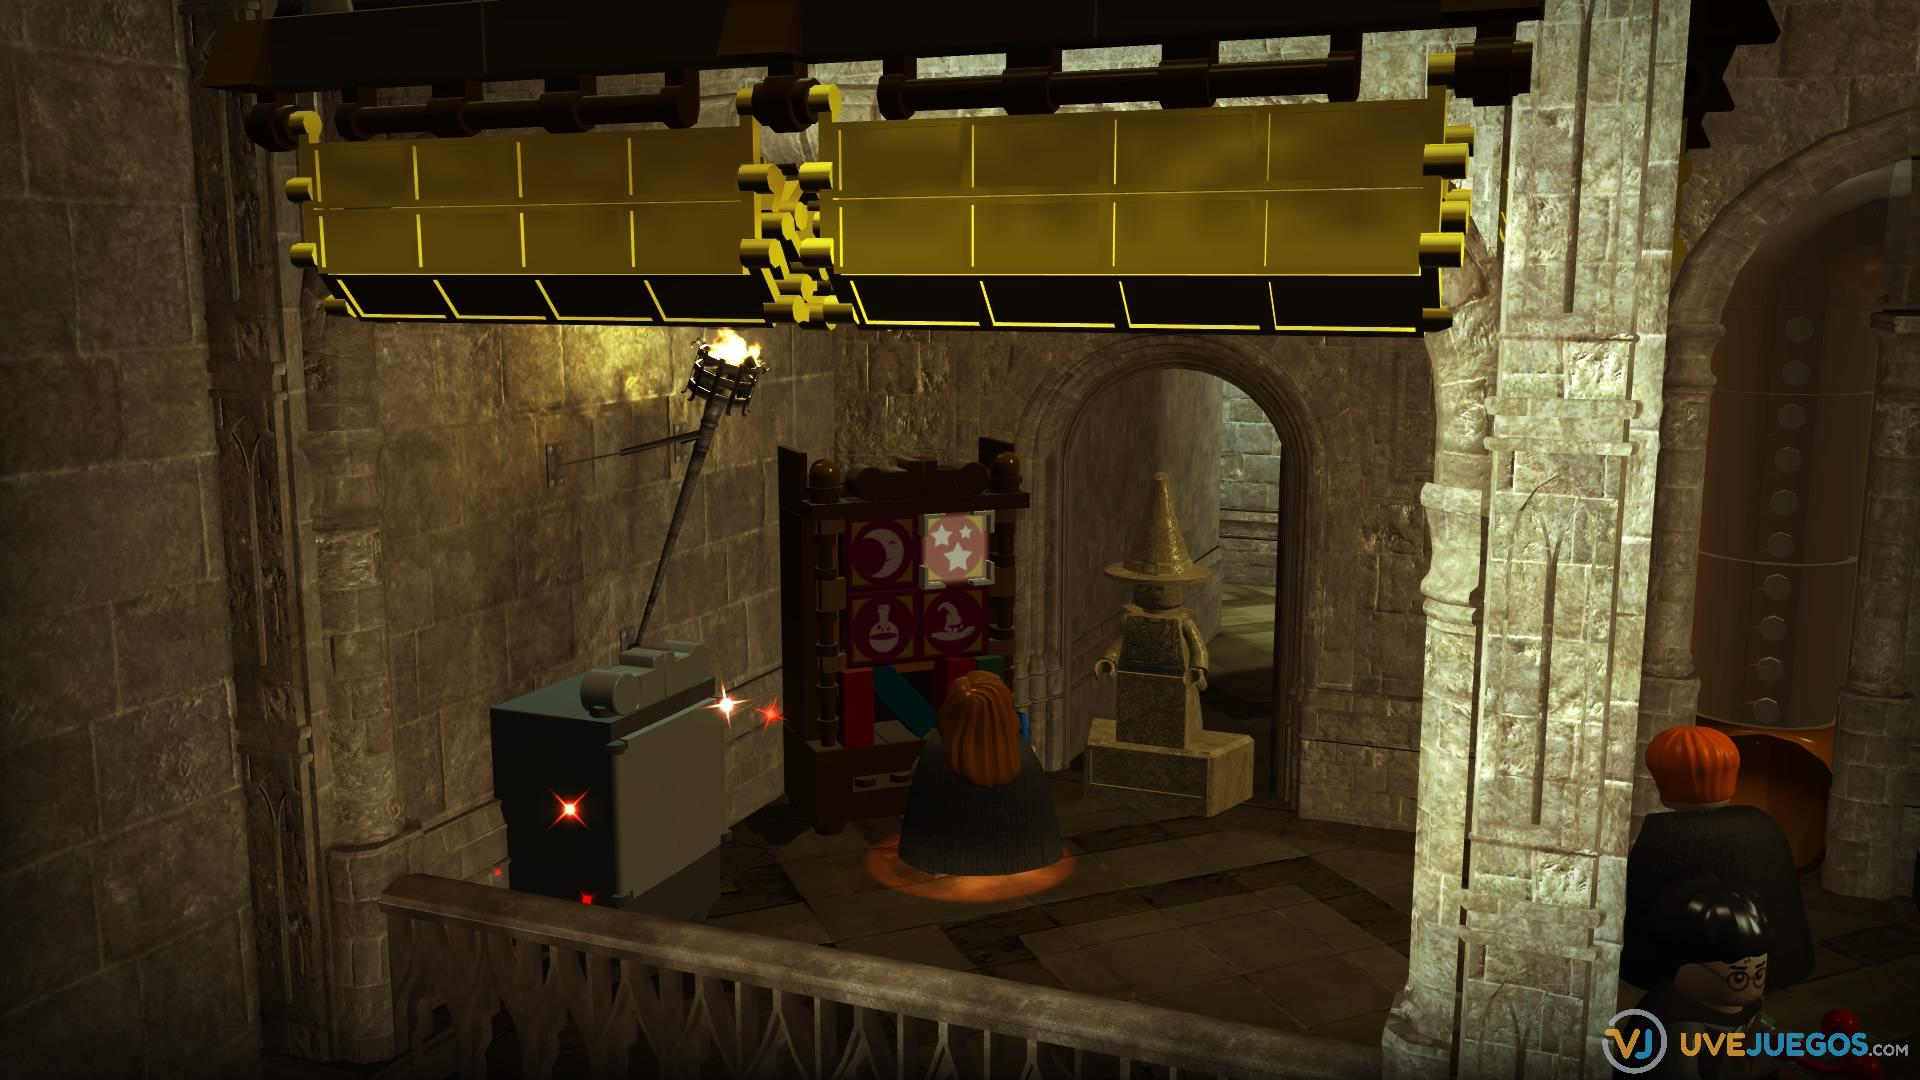 Analisis De Lego Harry Potter Collection Para Ps4 Uvejuegos Com